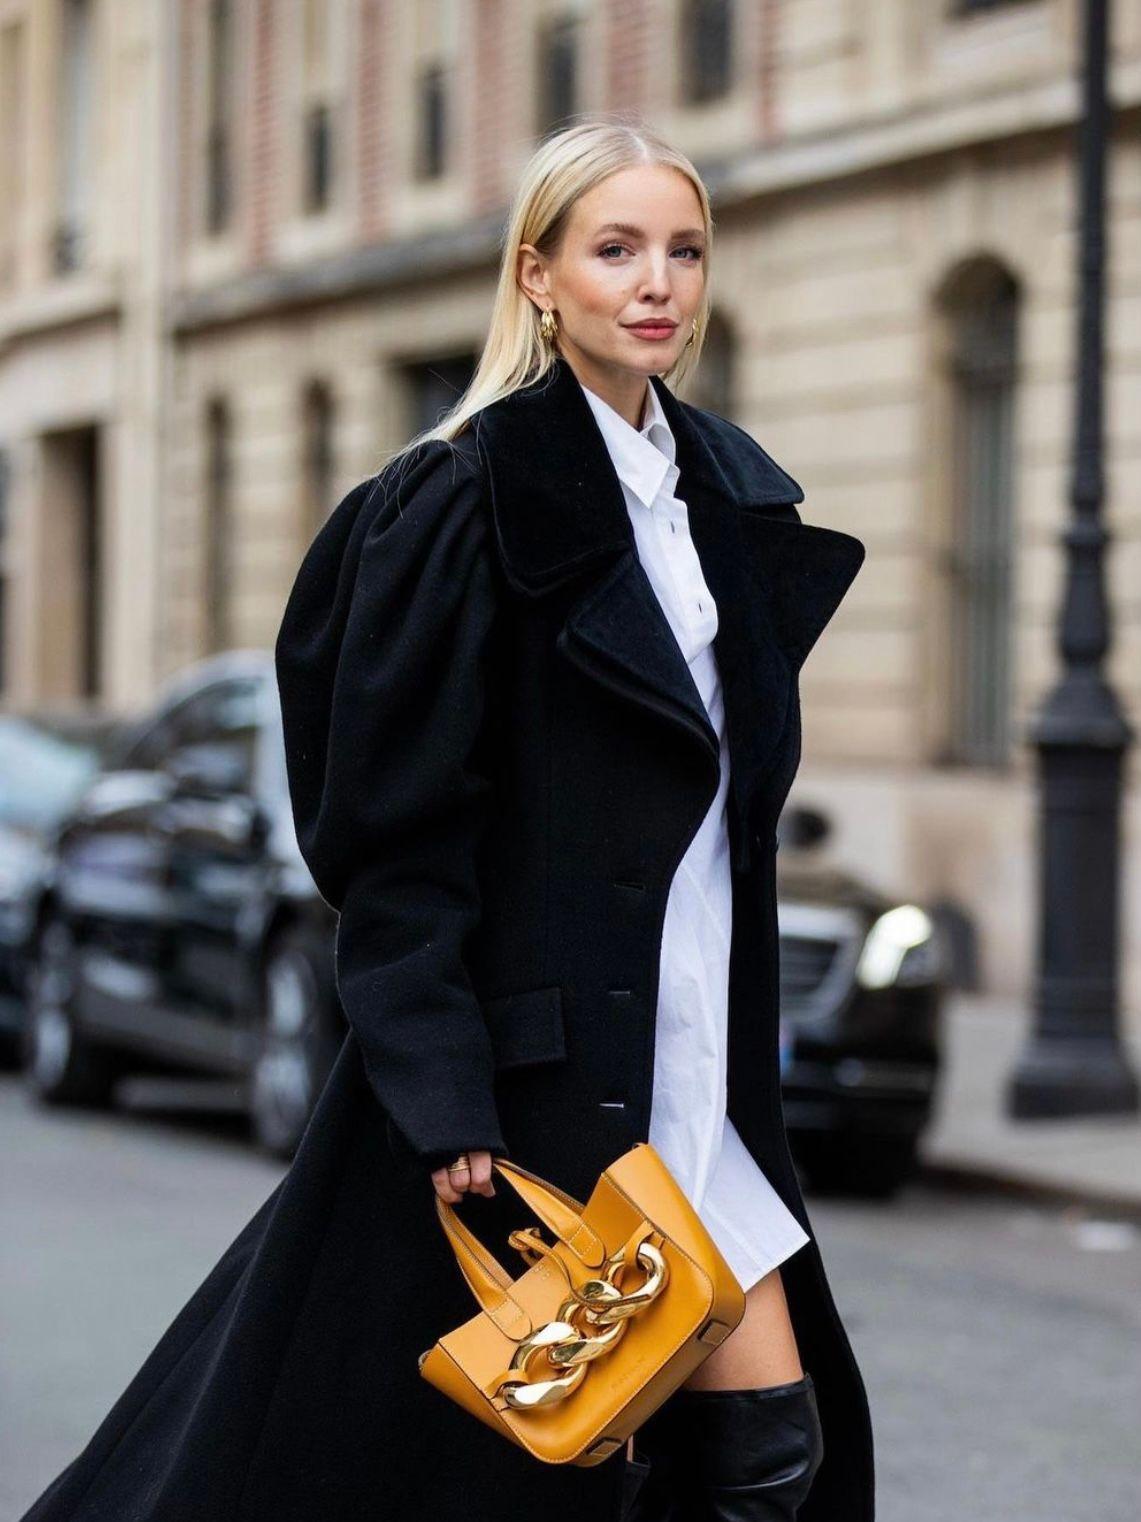 Paris Fashion Week @leoniehanne Instagram